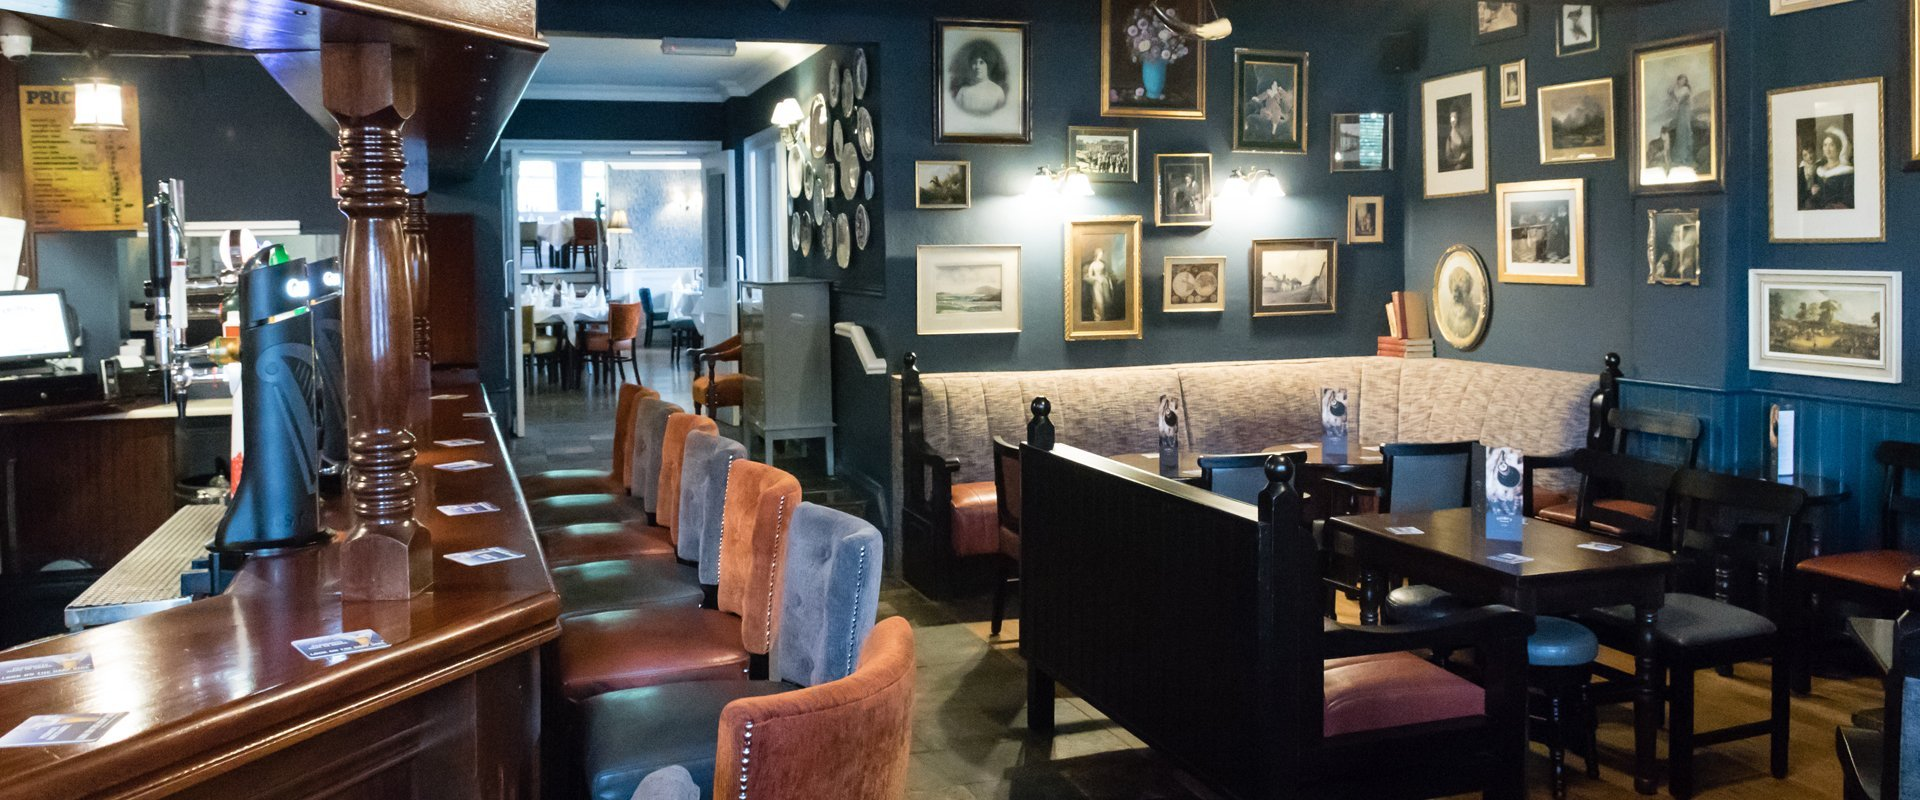 Digbys Bar & Restaurant interiors